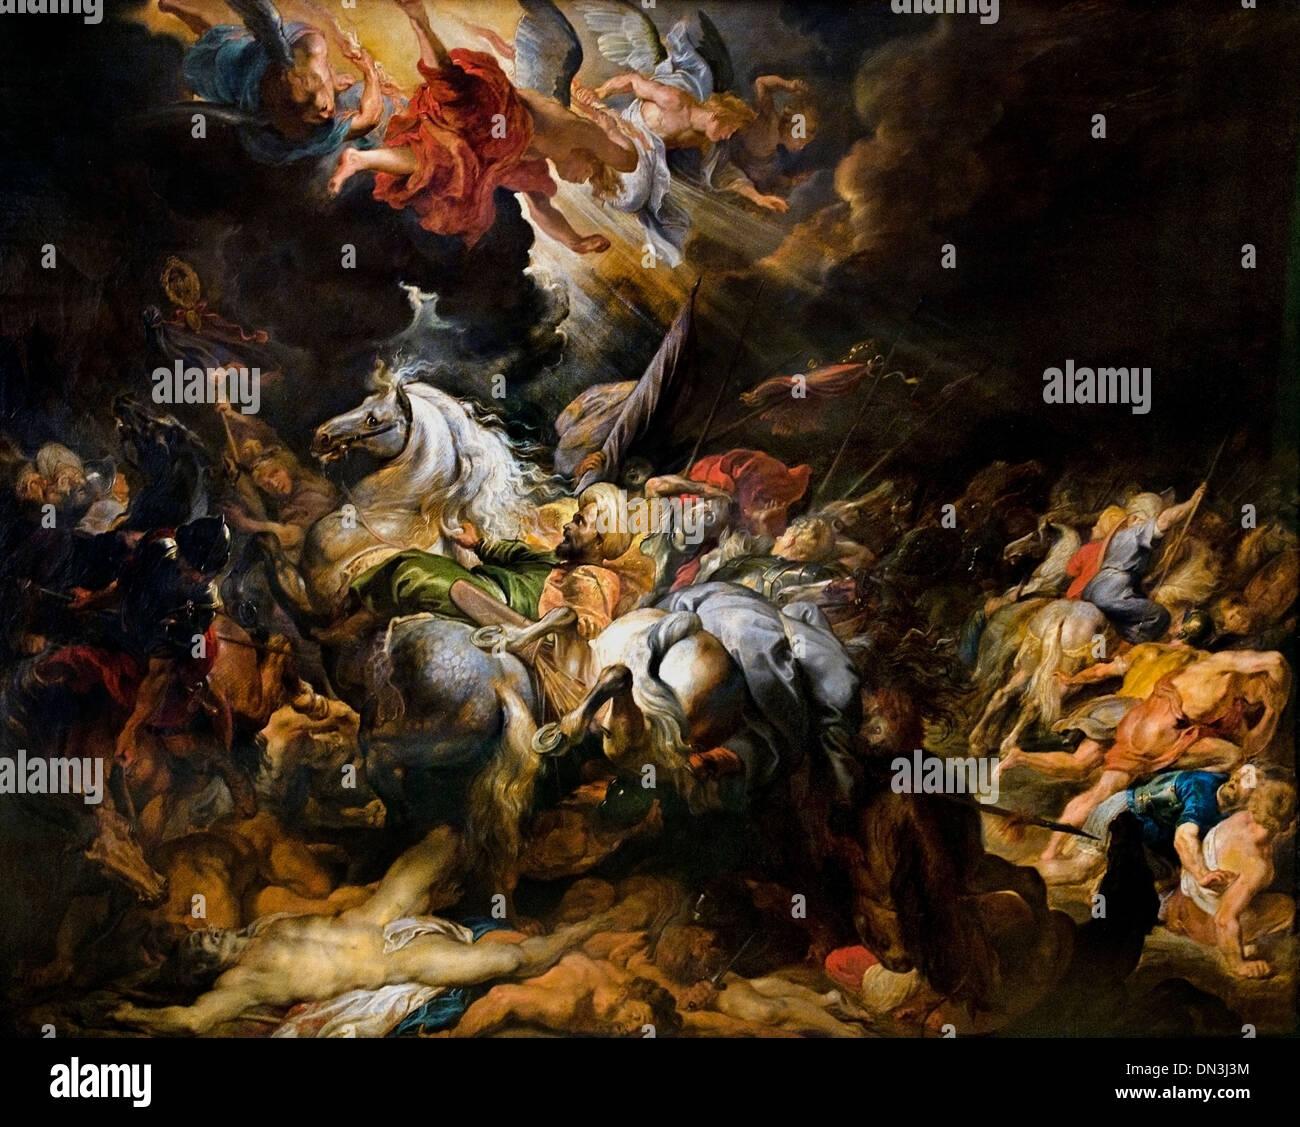 Peter Paul Rubens (1577–1640) Flemish Belgian Belgium Defeat of Sennacherib, 1616-1618 - Stock Image